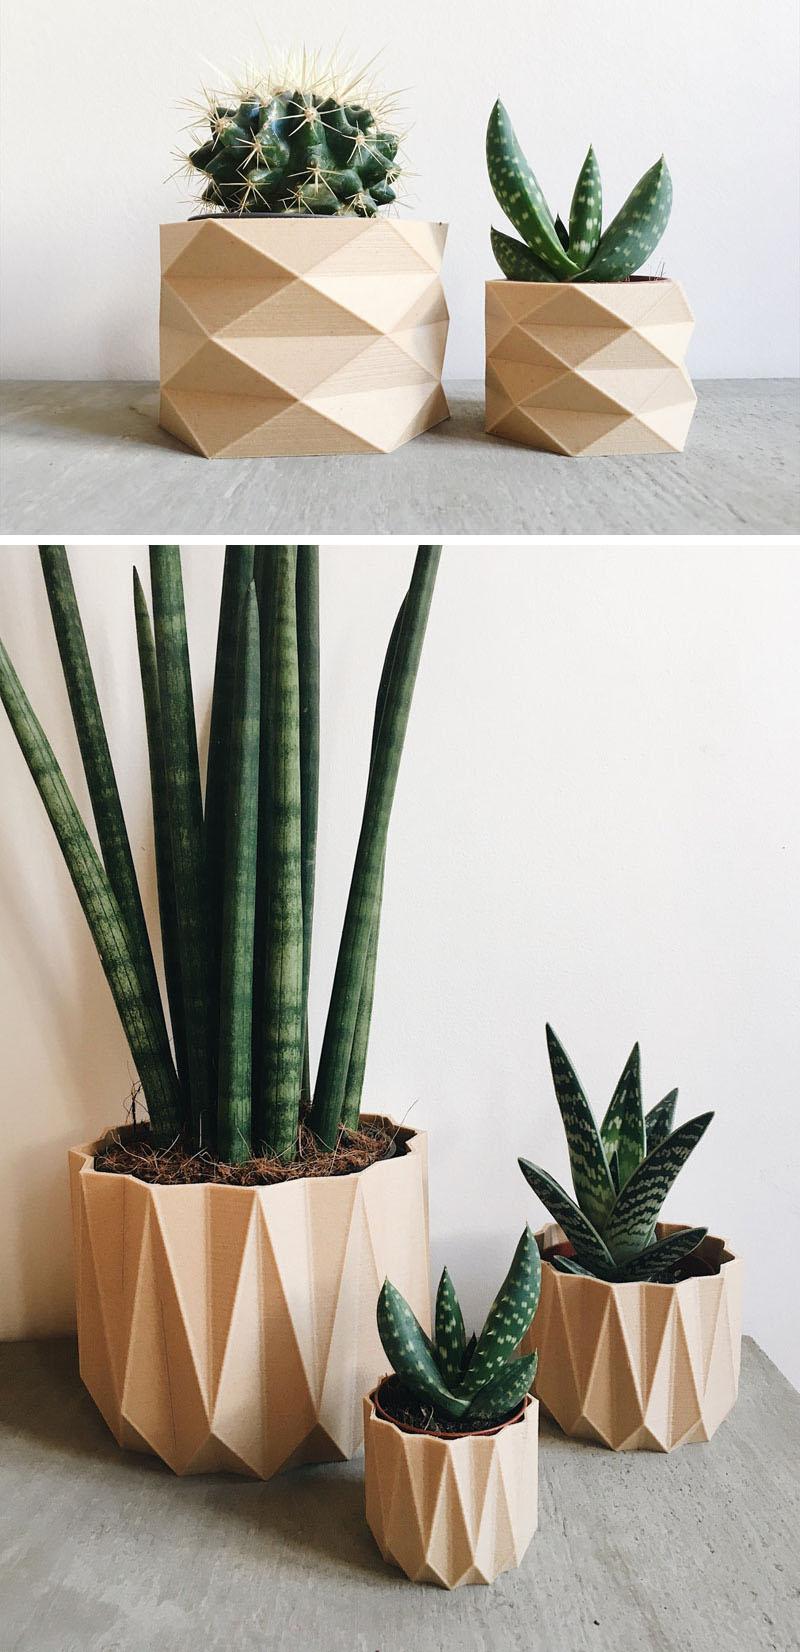 3d-printed-modern-wood-planters-080317-1113-04